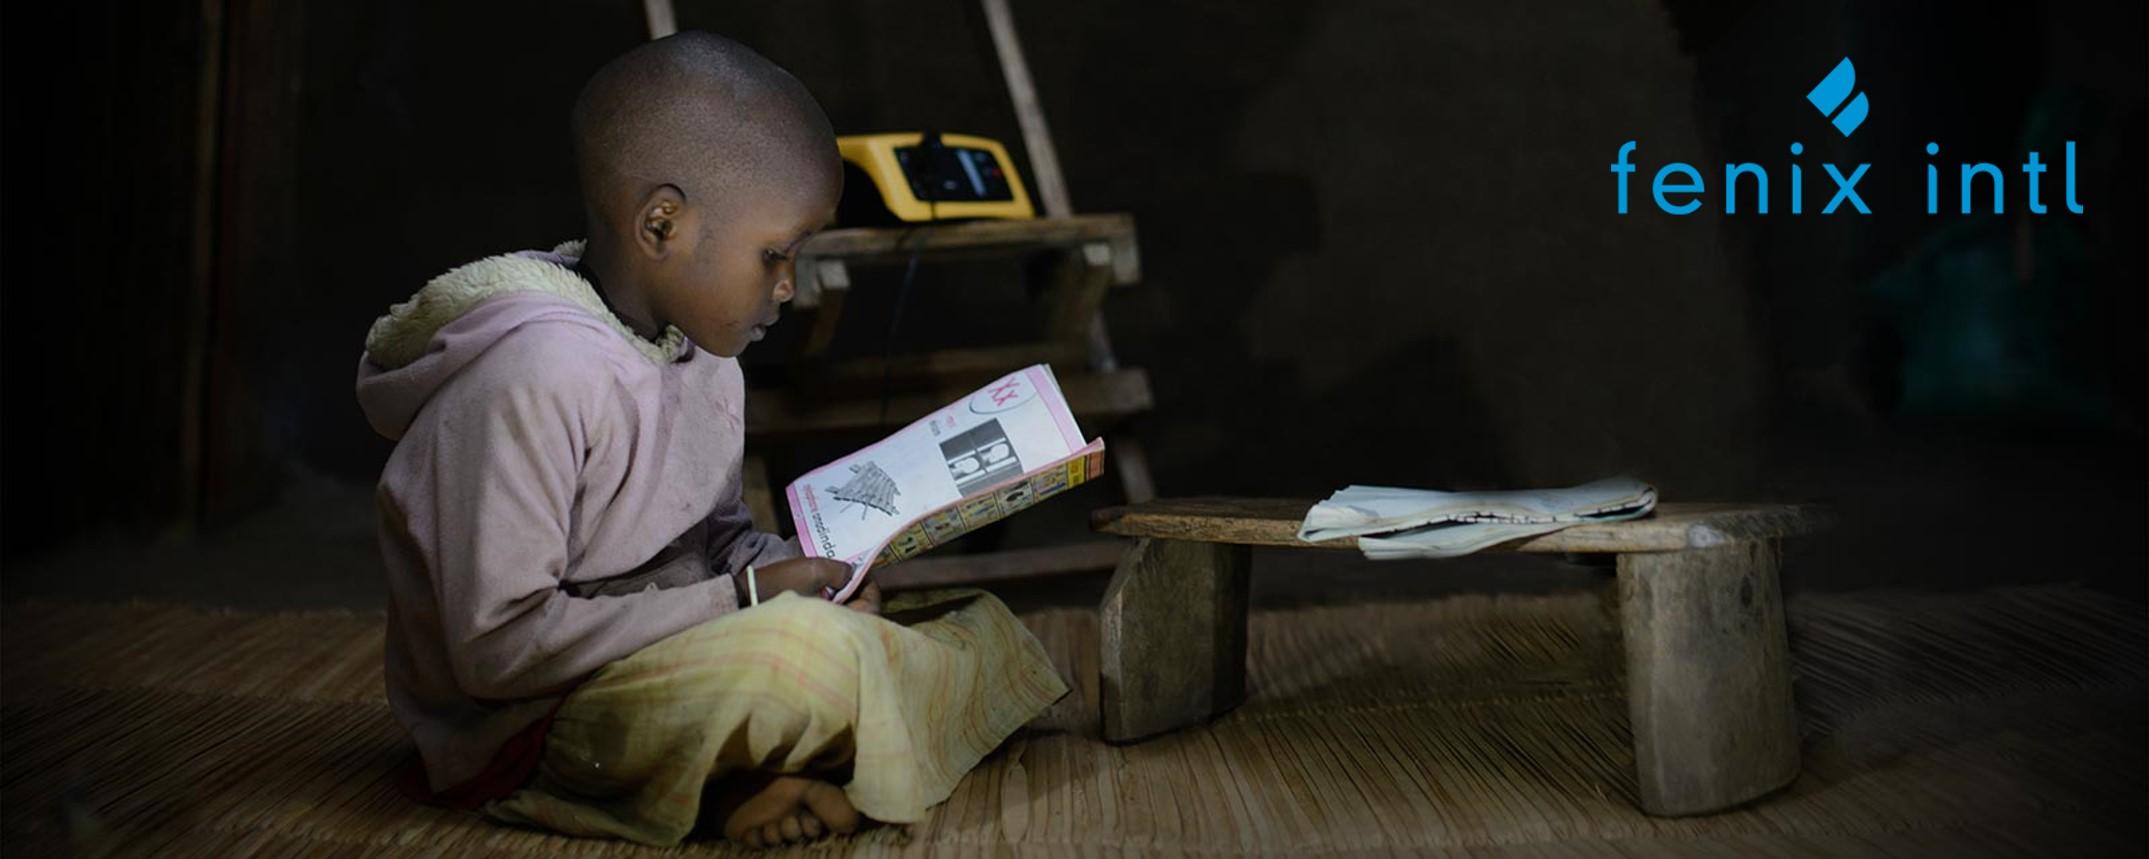 Fenix International - Marketing & Communications Lead Movemeback African opportunity cover image